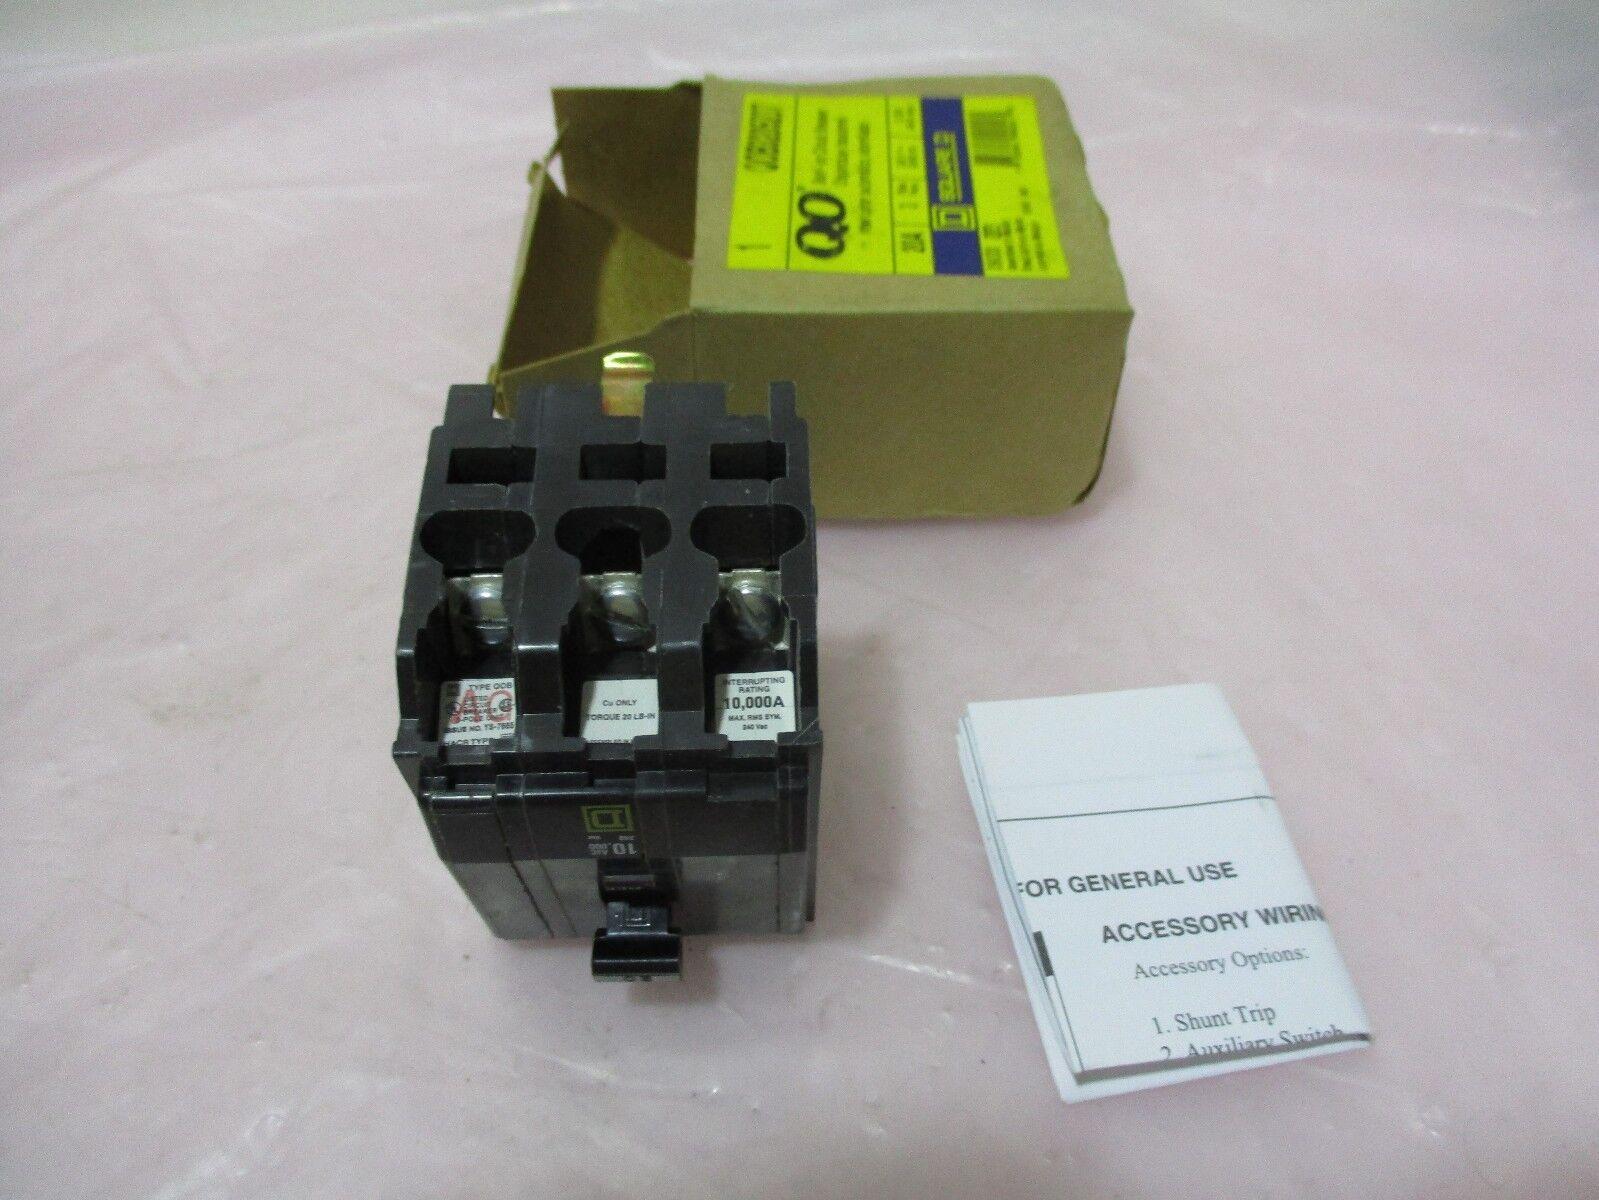 Square D QOB3205231 Circuit Breaker, 20A, 3 Pole, 240v, 50/60Hz, 420354